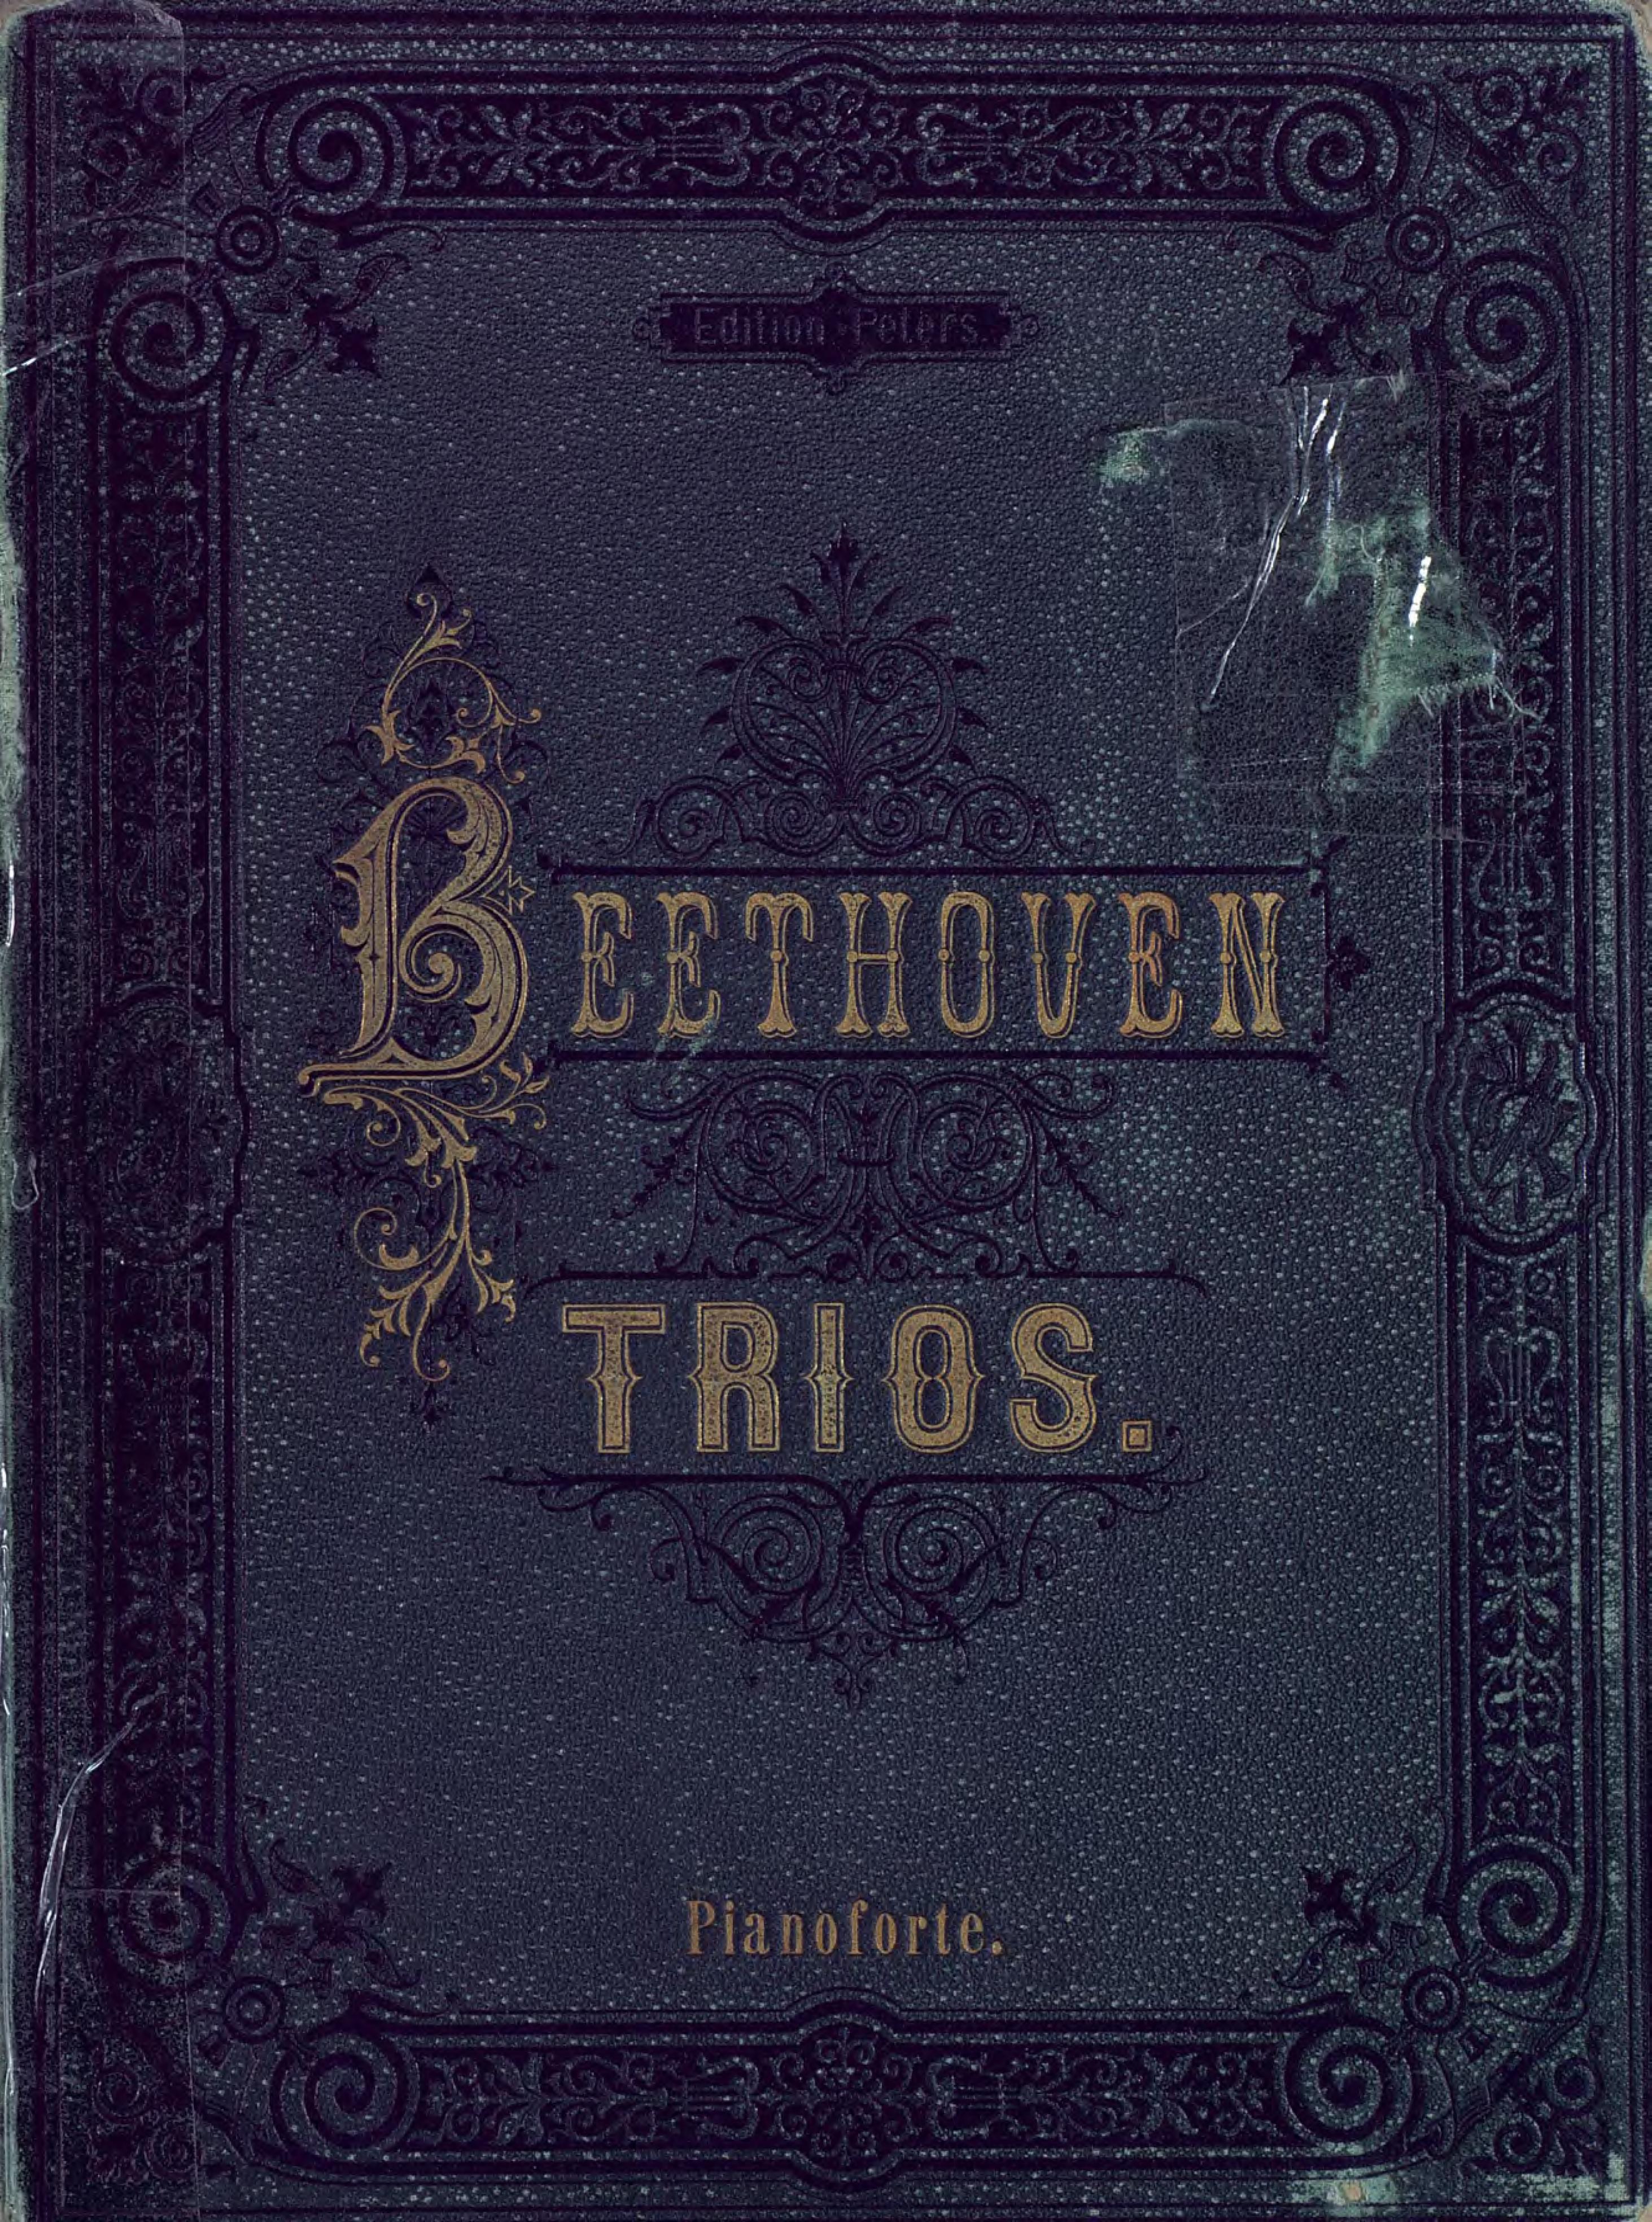 Людвиг ван Бетховен Trios fur Pianoforte, Violine und Violoncell v. L. van Beethoven джузеппе верди quartett fur 2 violinen viola und violoncell v g verdi e moll